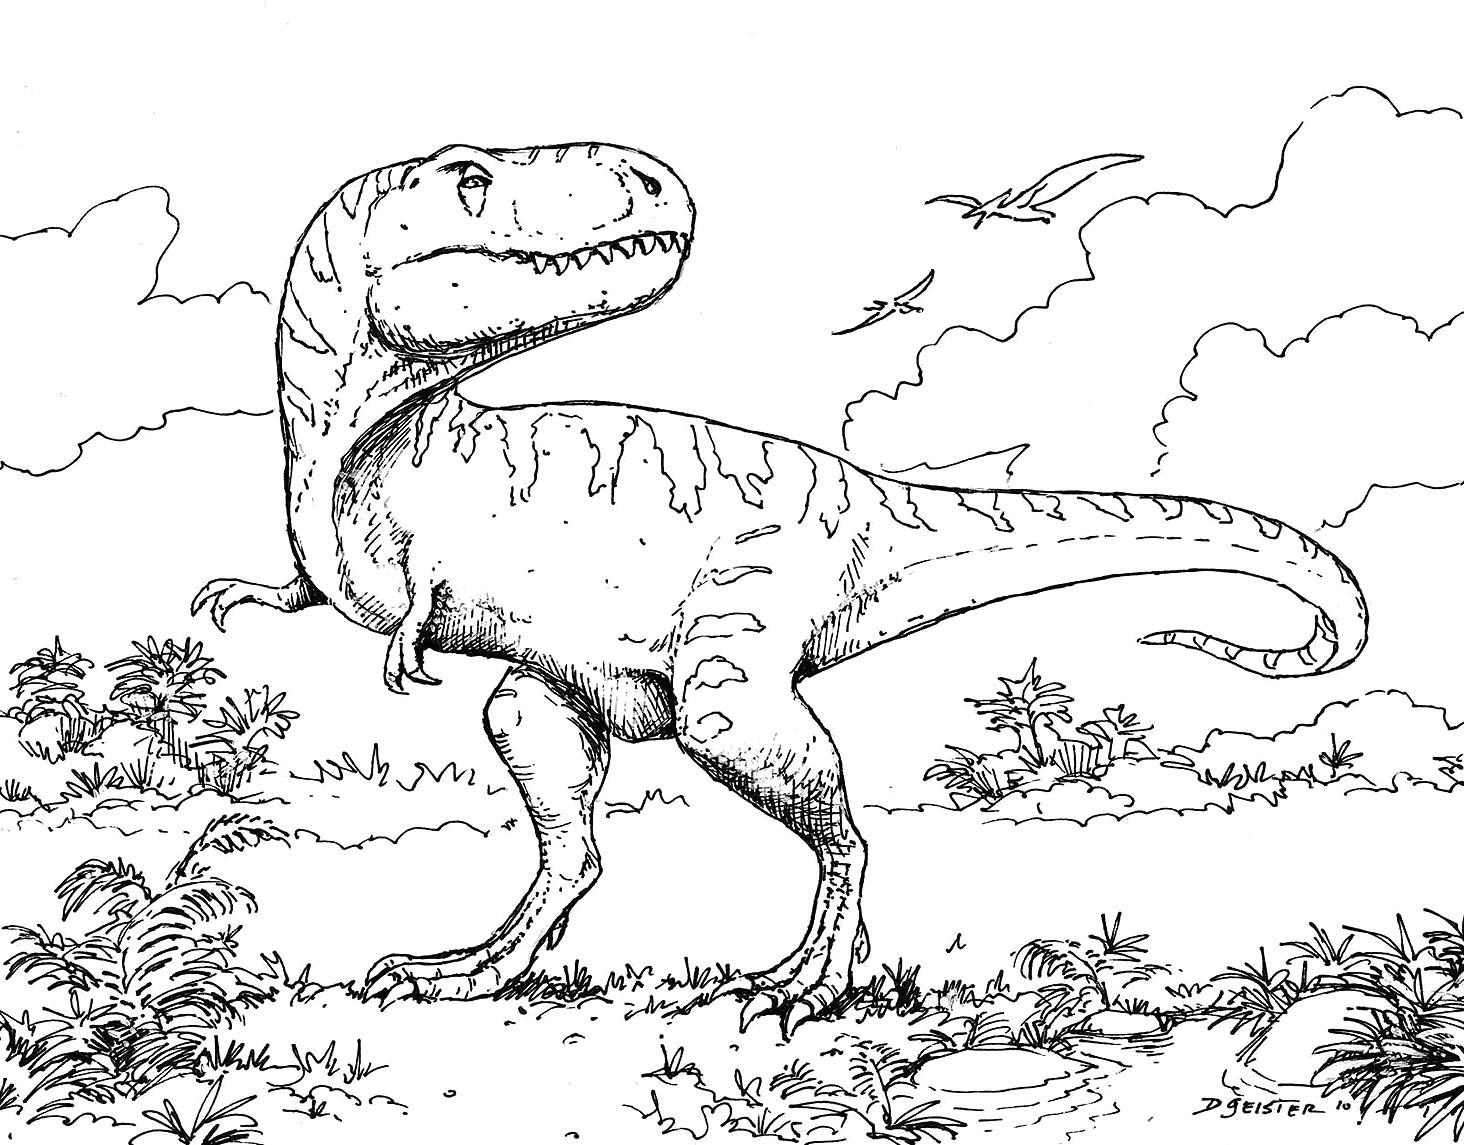 Coloriage Dinosaure Imprimer.Coloriage De Dinosaure A Imprimer 1001 Animaux